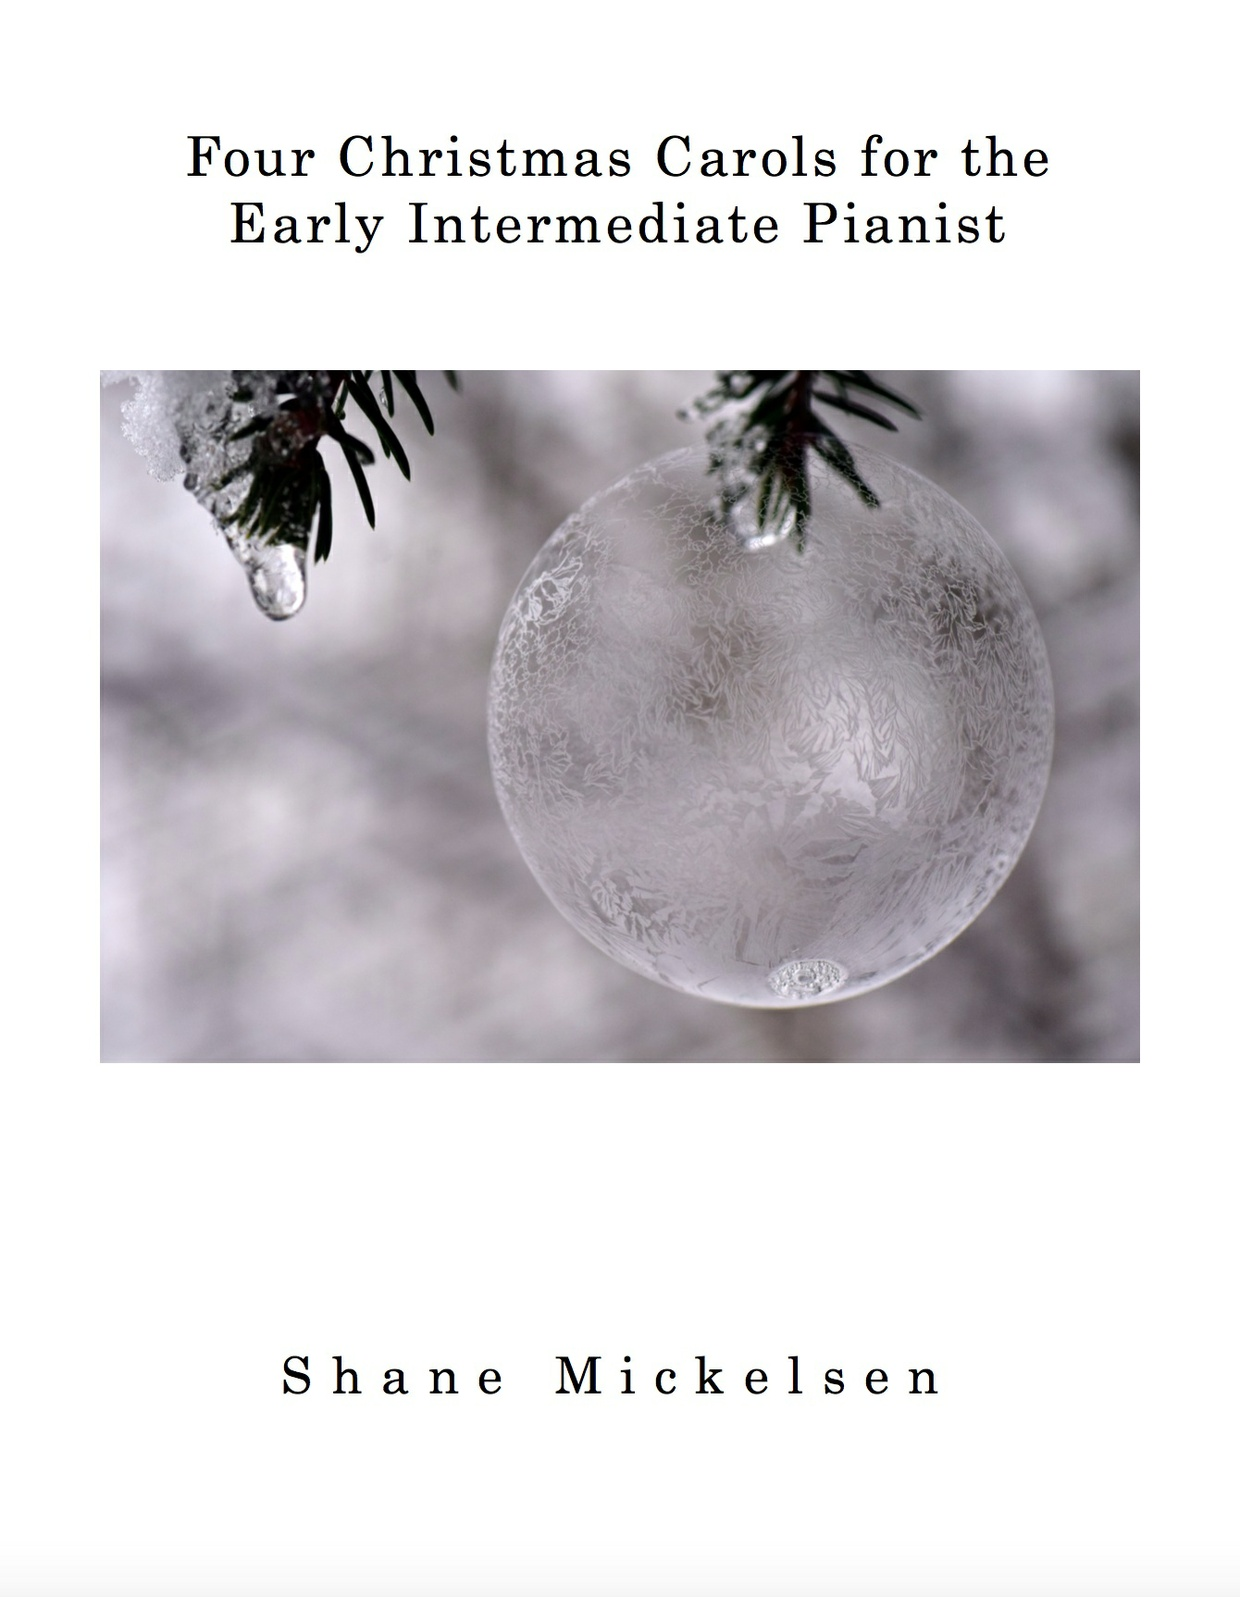 Four Christmas Carols for the Intermediate Pianist